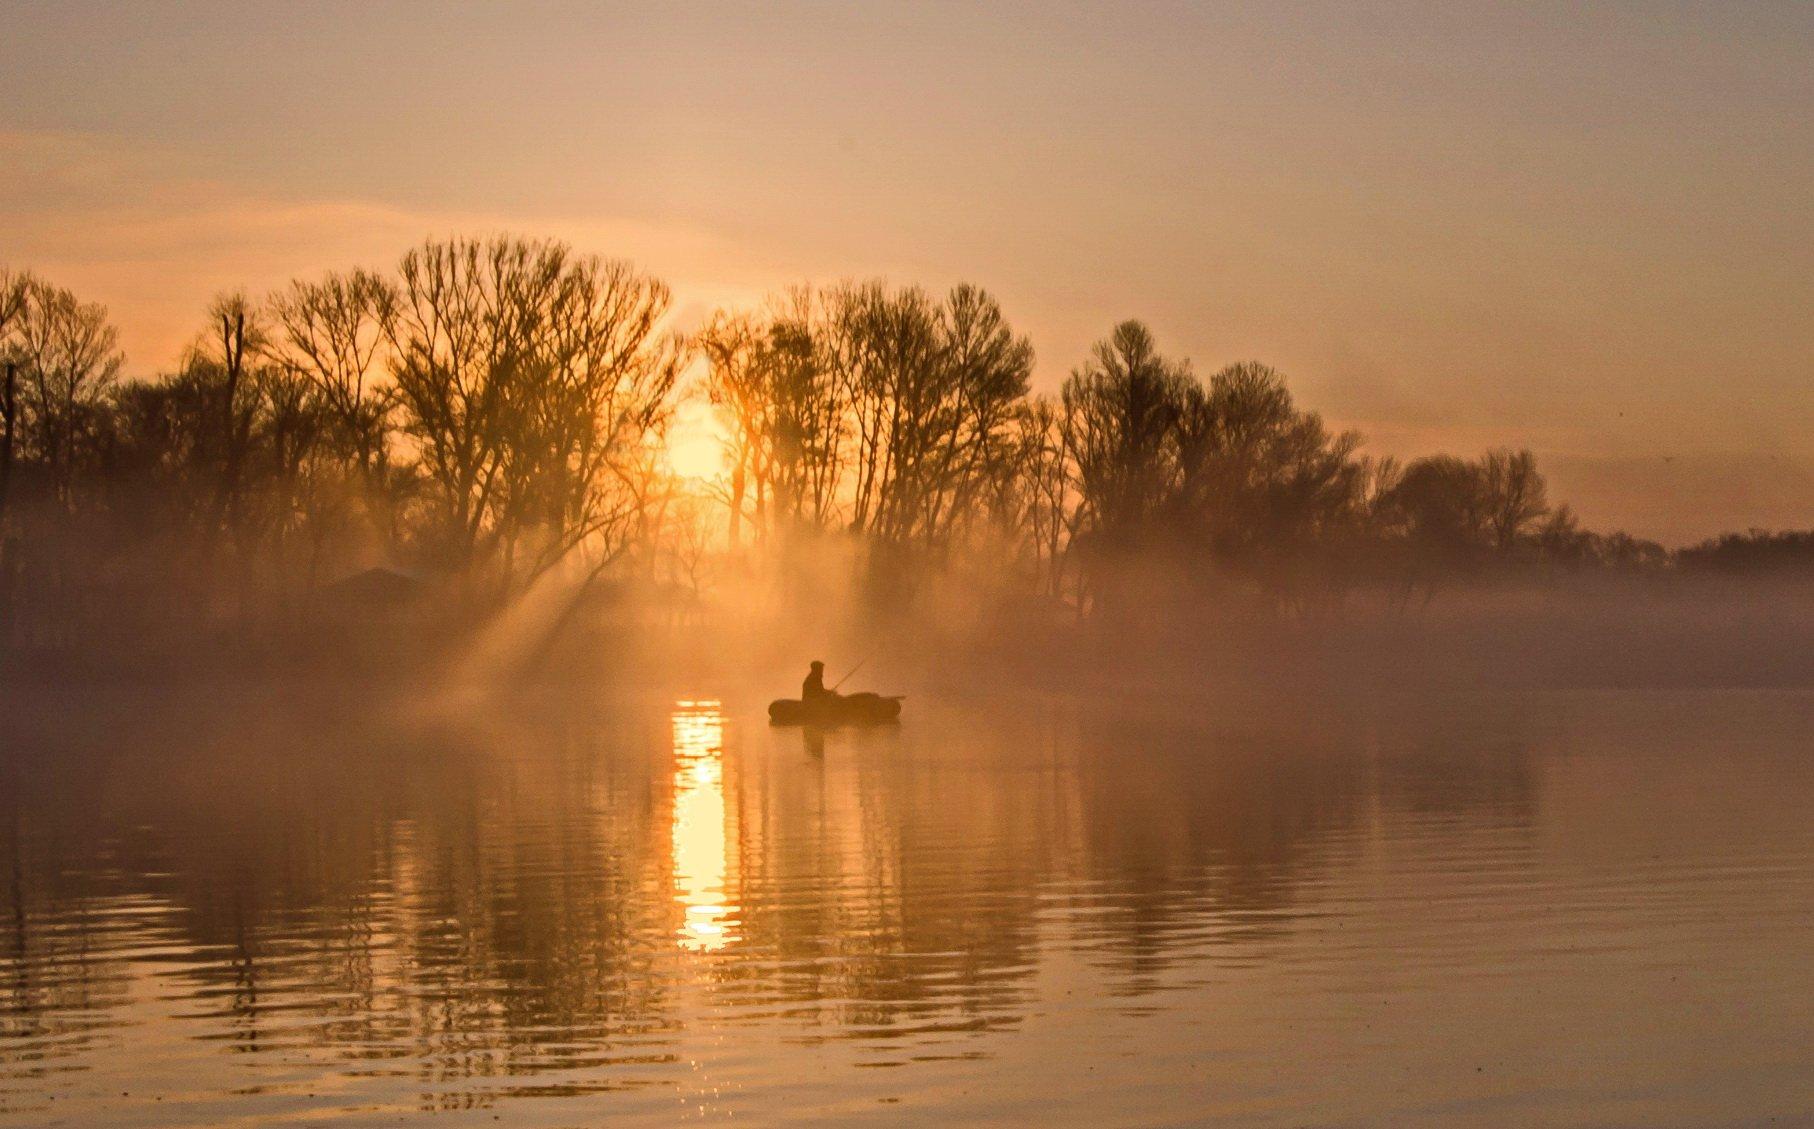 март, восход, рассвет, туман, рыбак, Валерий Наумов